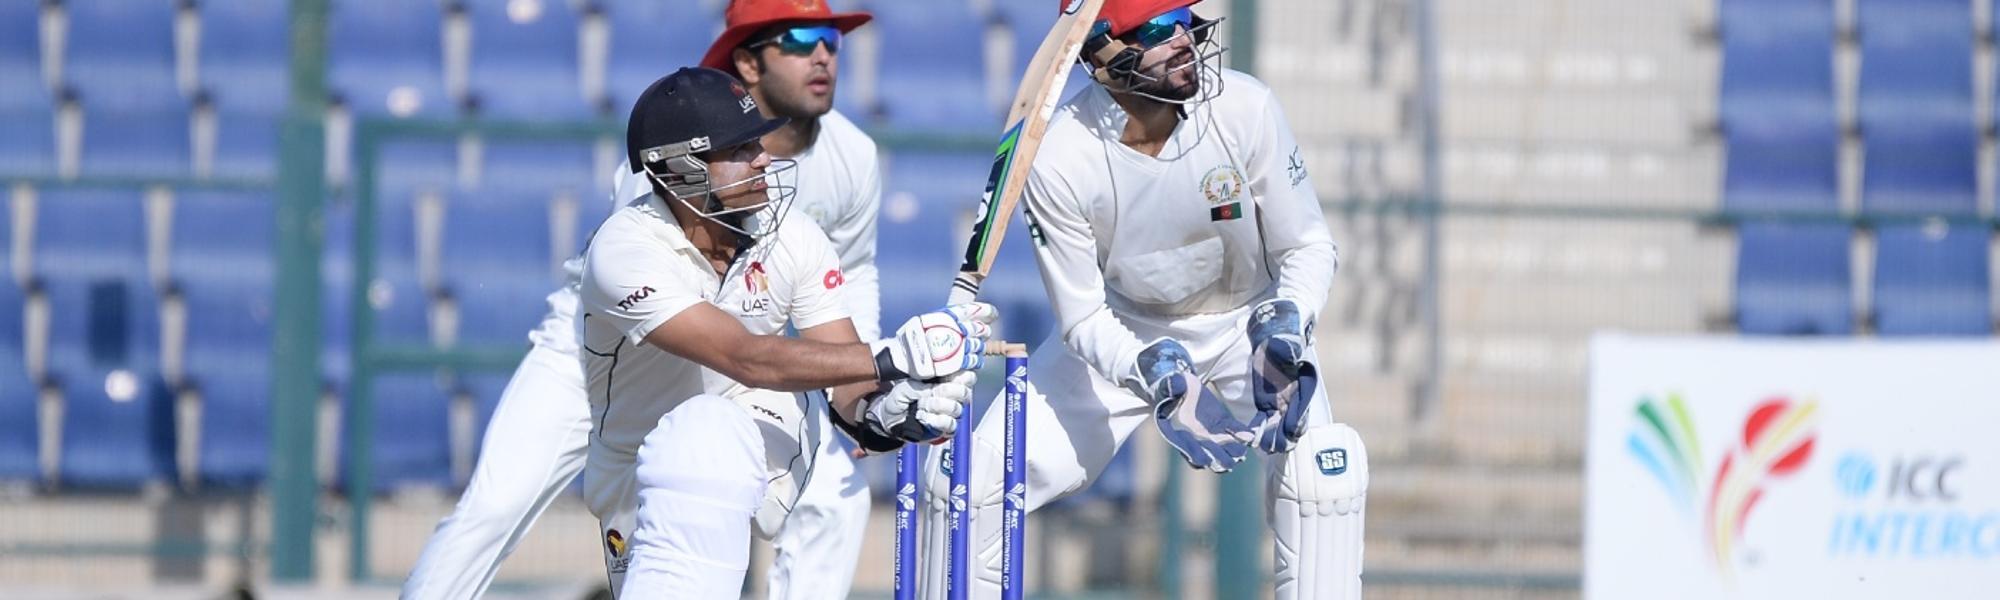 UAE batting